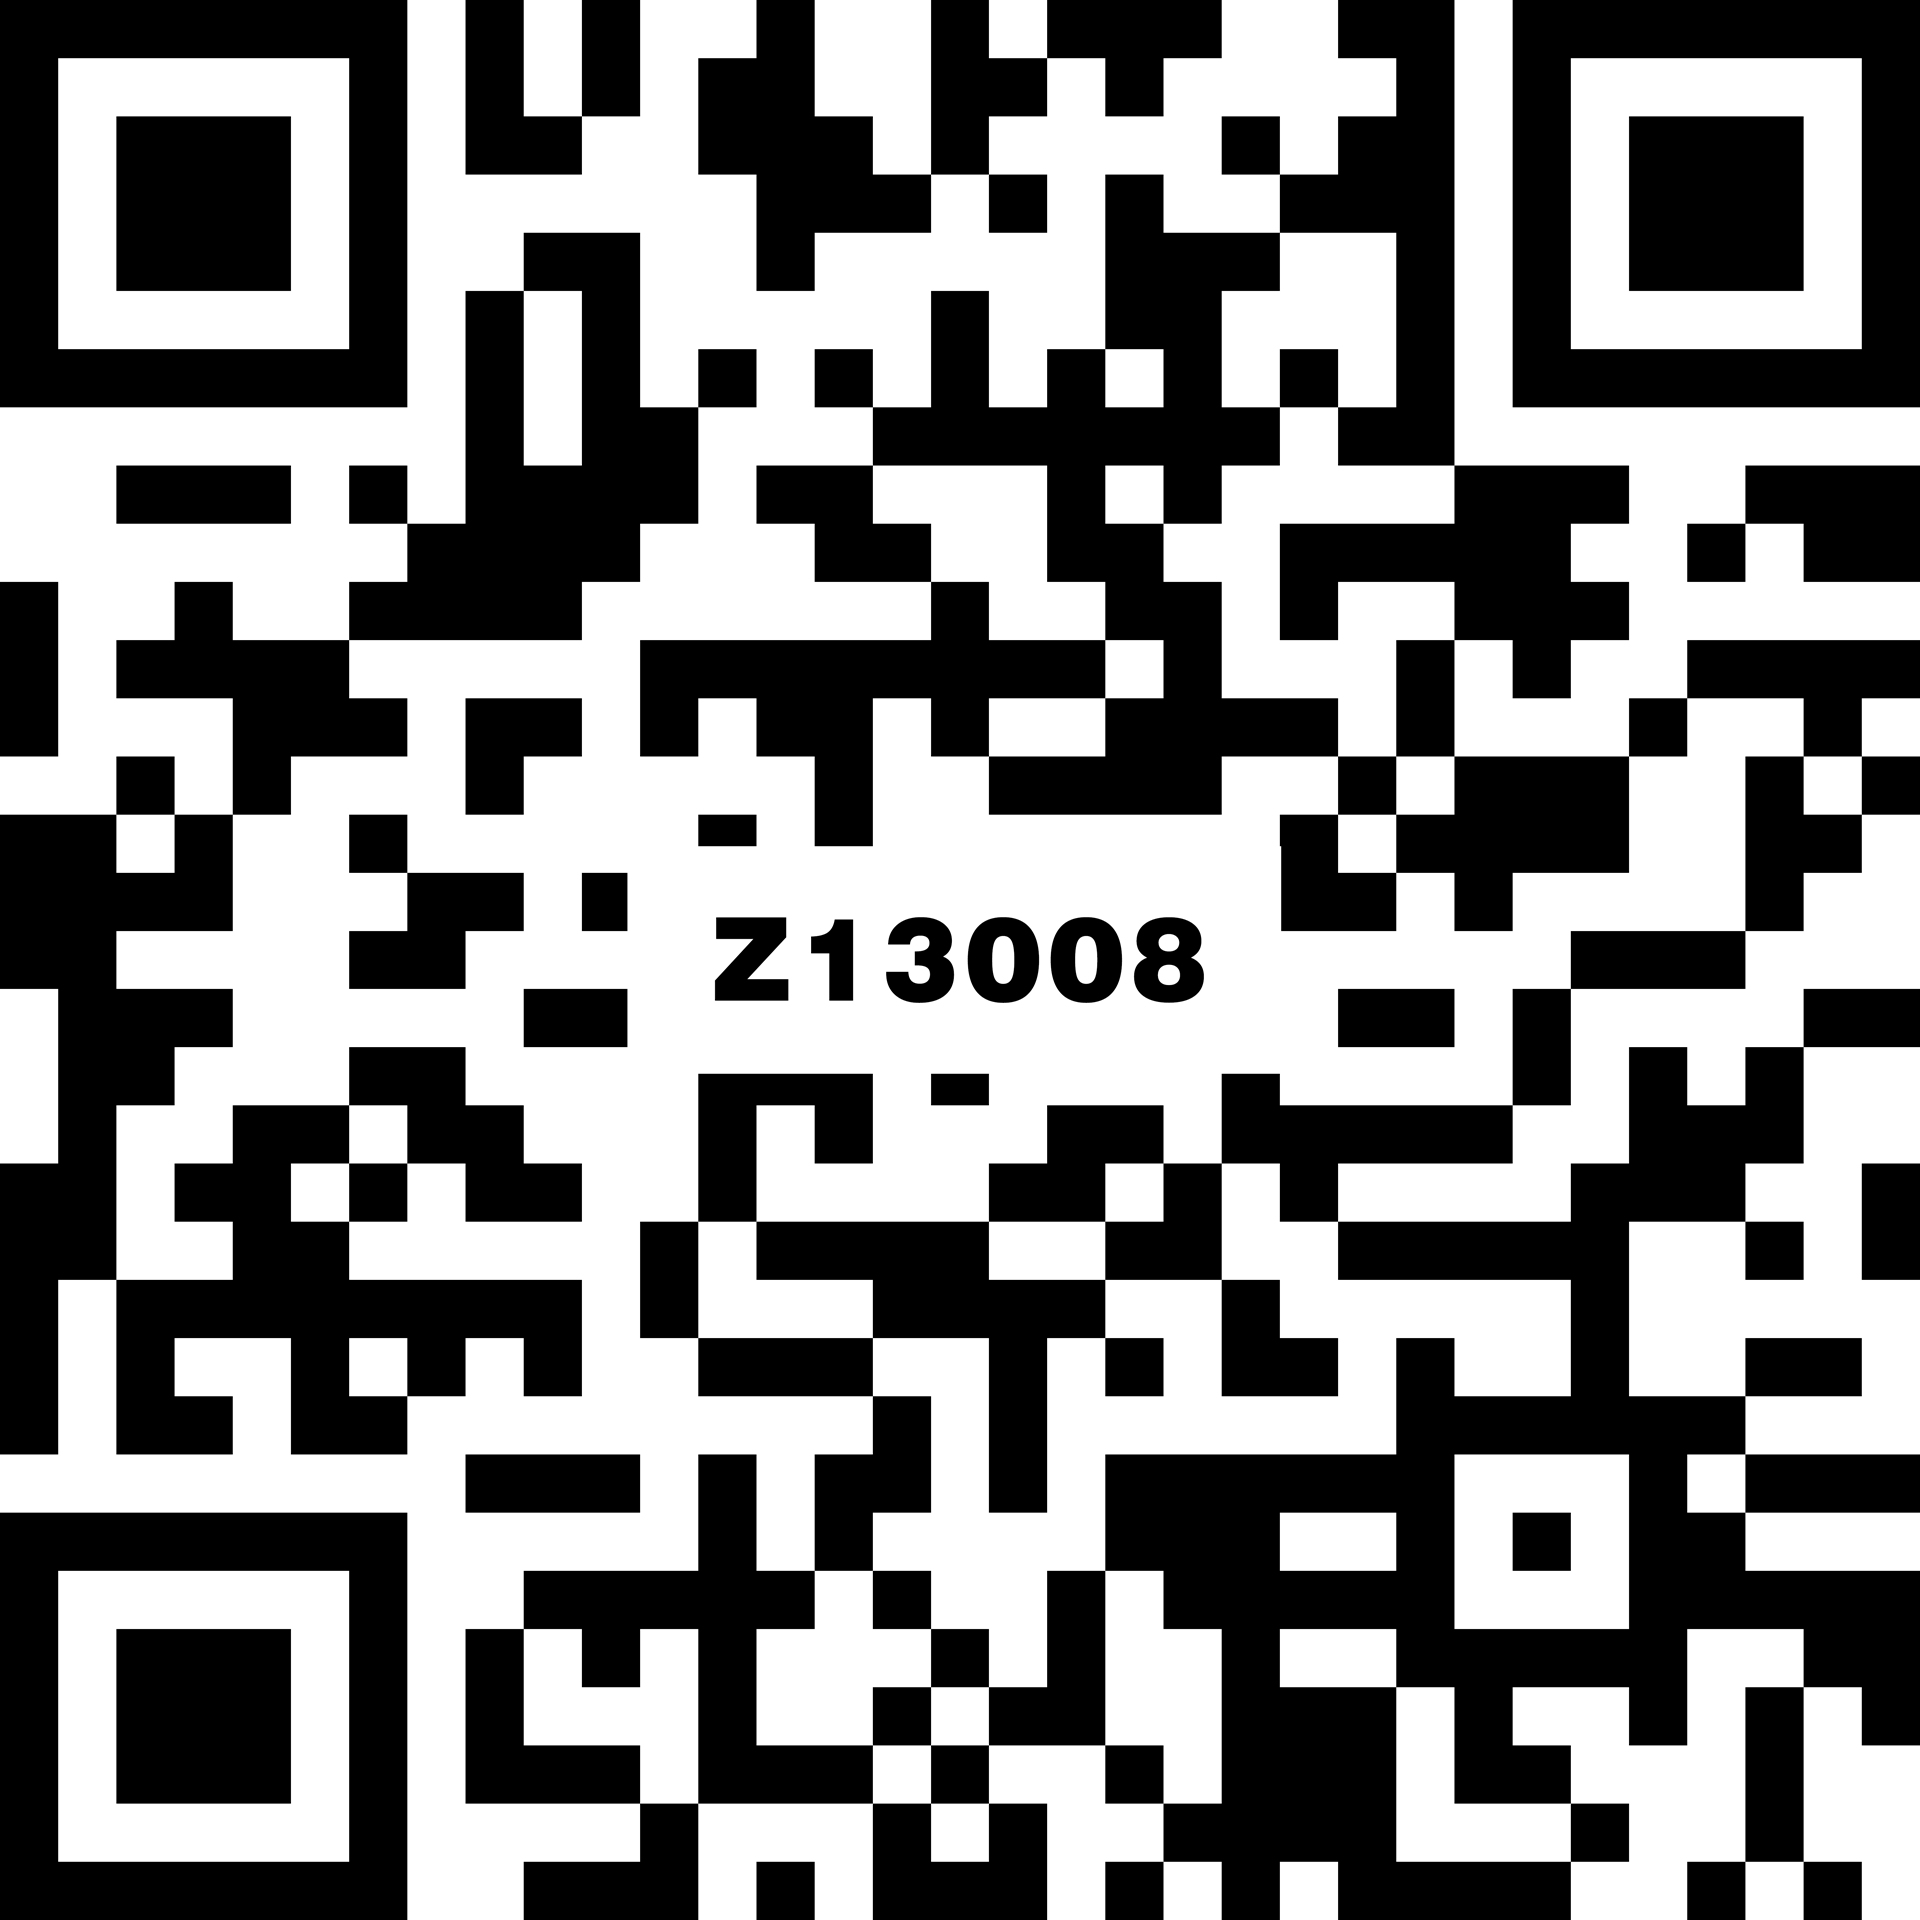 Z13008